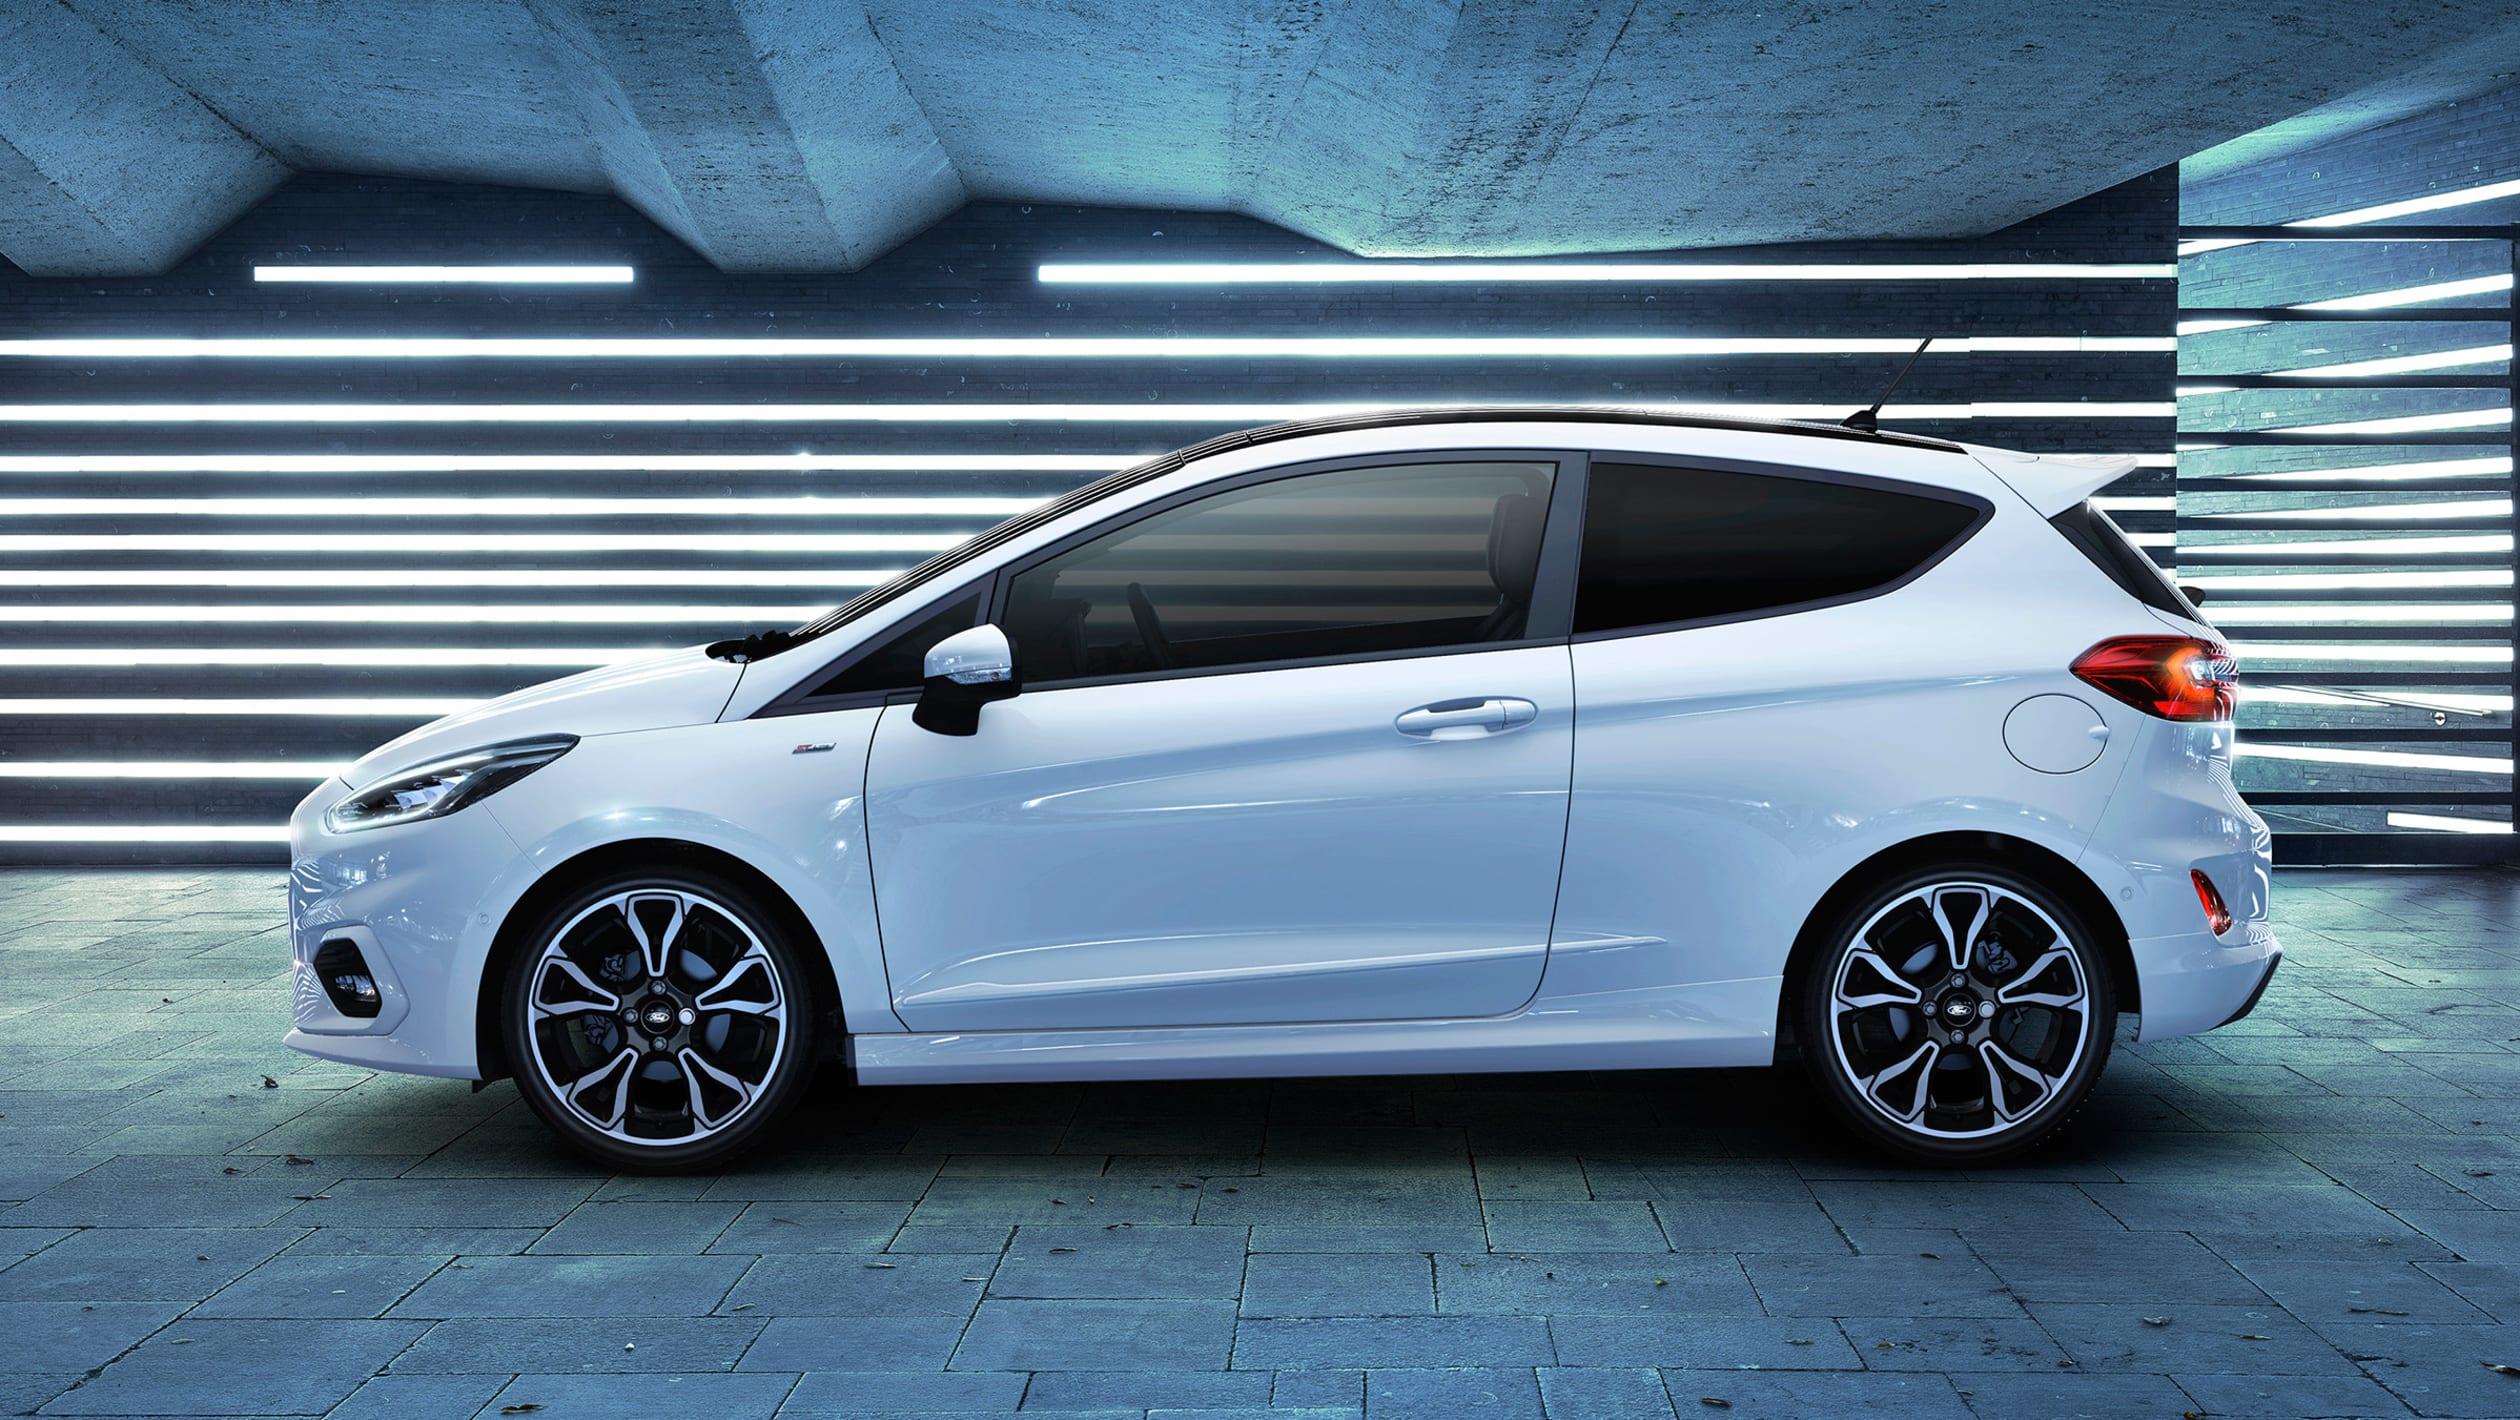 2017 - [Ford] Fiesta MkVII  - Page 16 New%20Ford%20Fiesta%20EcoBoost%20Hybrid-2